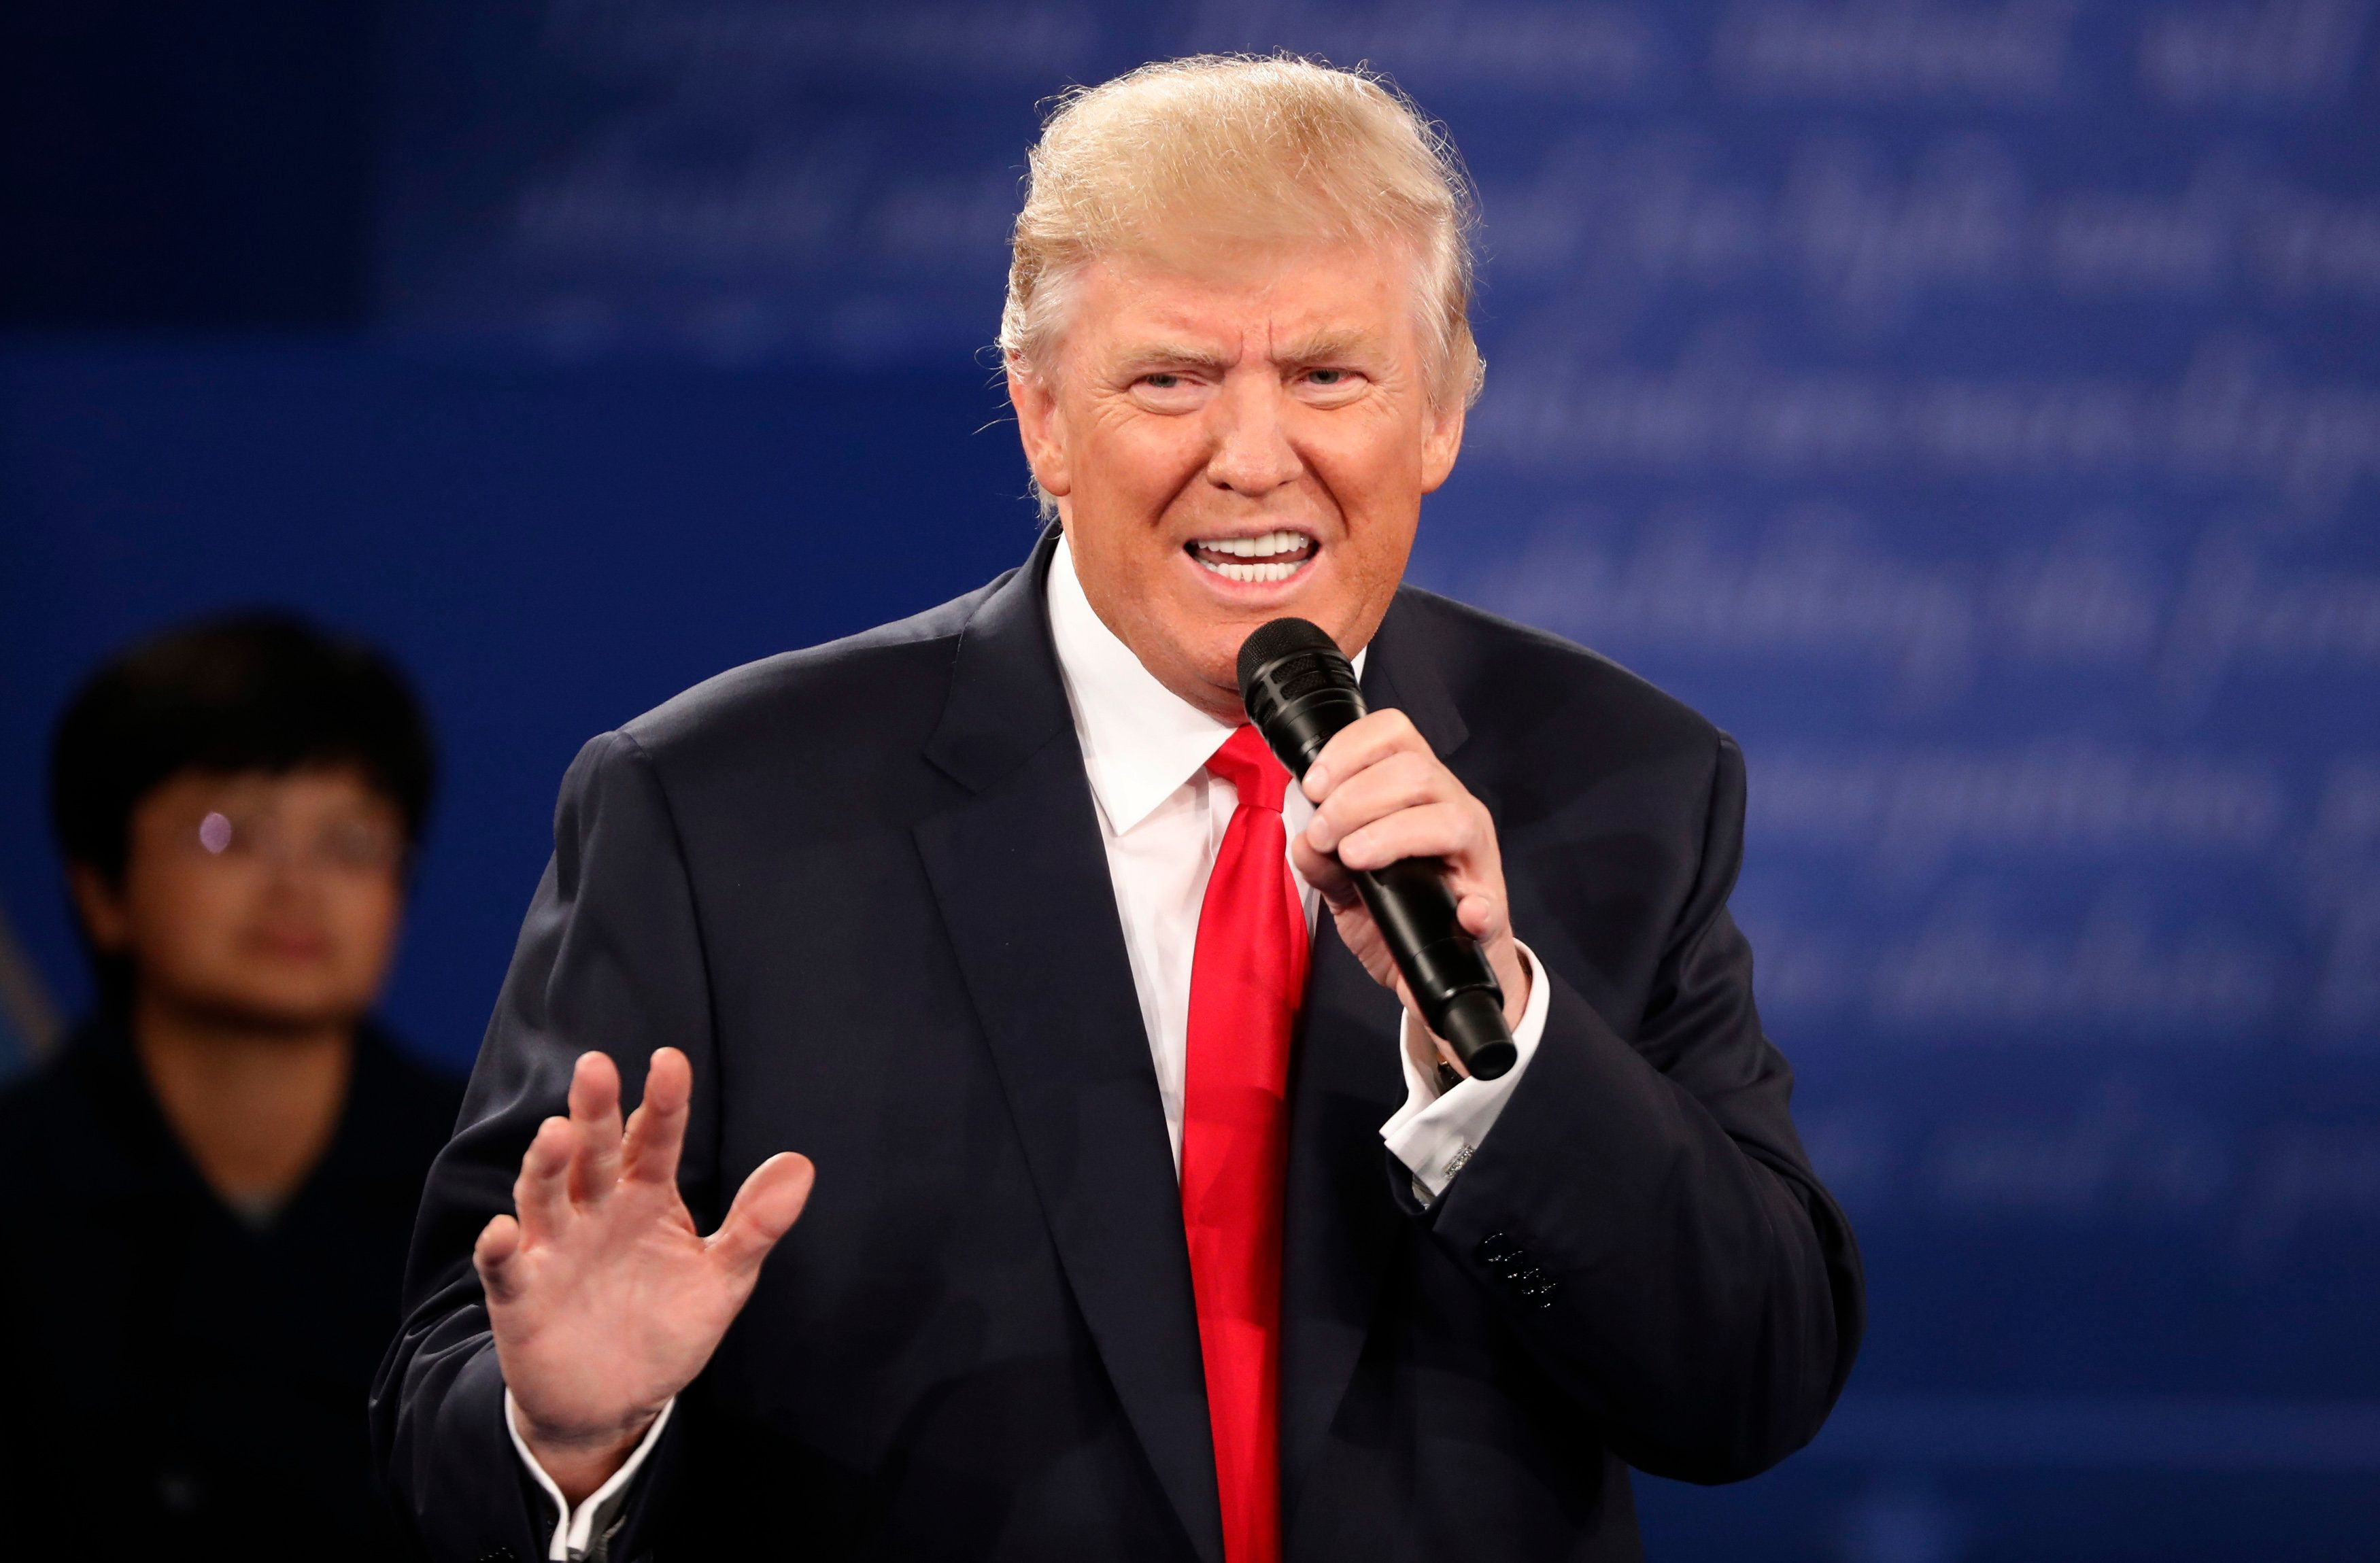 Republican U.S. presidential nominee Donald Trump speaks during the presidential town hall debate with Democratic U.S. presid